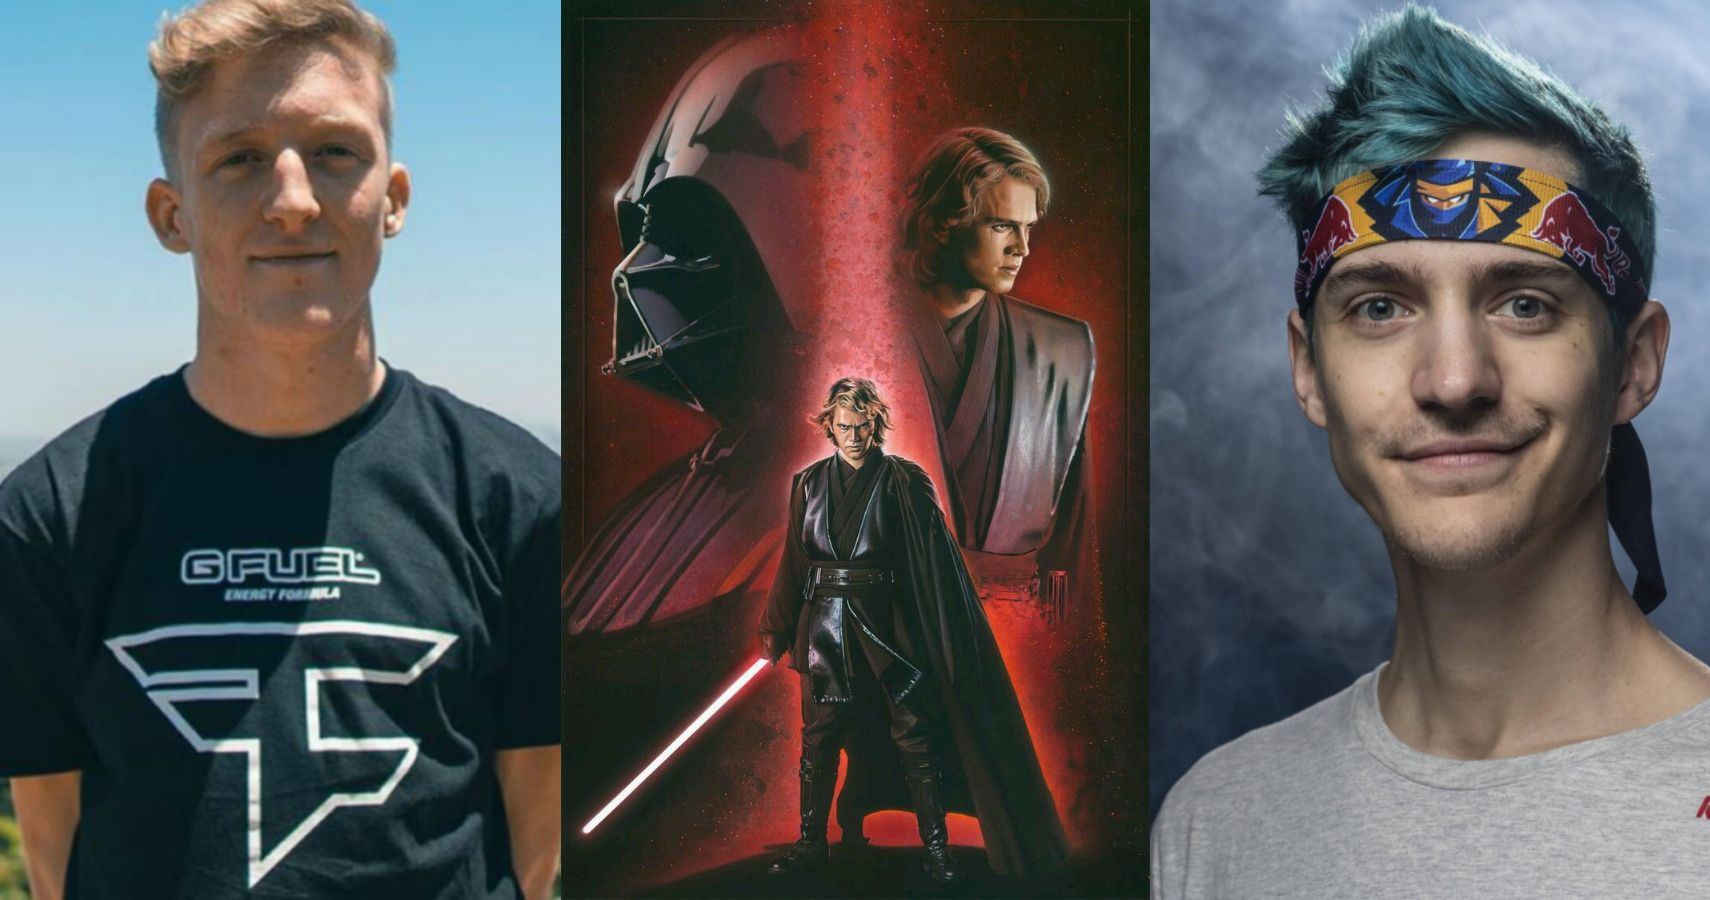 Tfue Says 'I'm Like Darth Vader And He's Anakin Skywalker' About Ninja